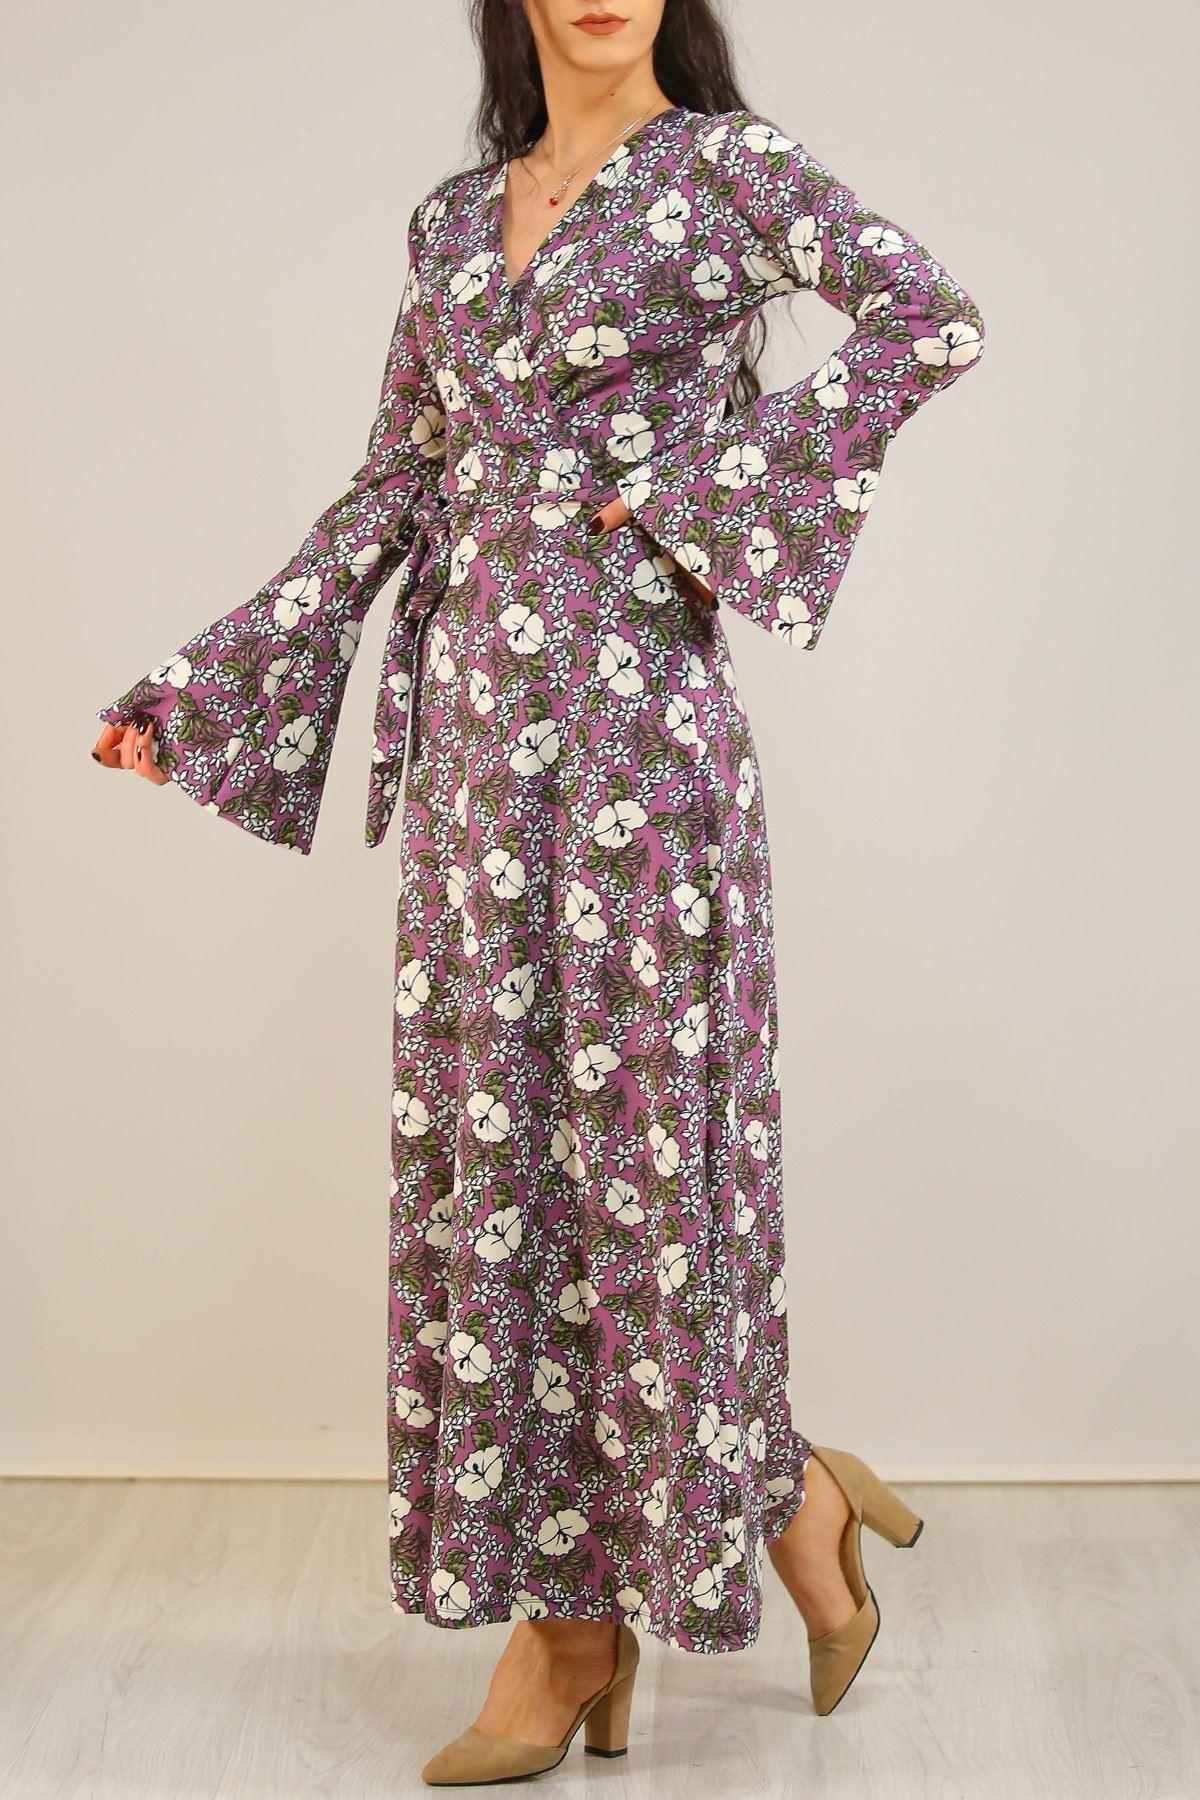 İspanyolkol Desenli Elbise Mor - 5075.716.